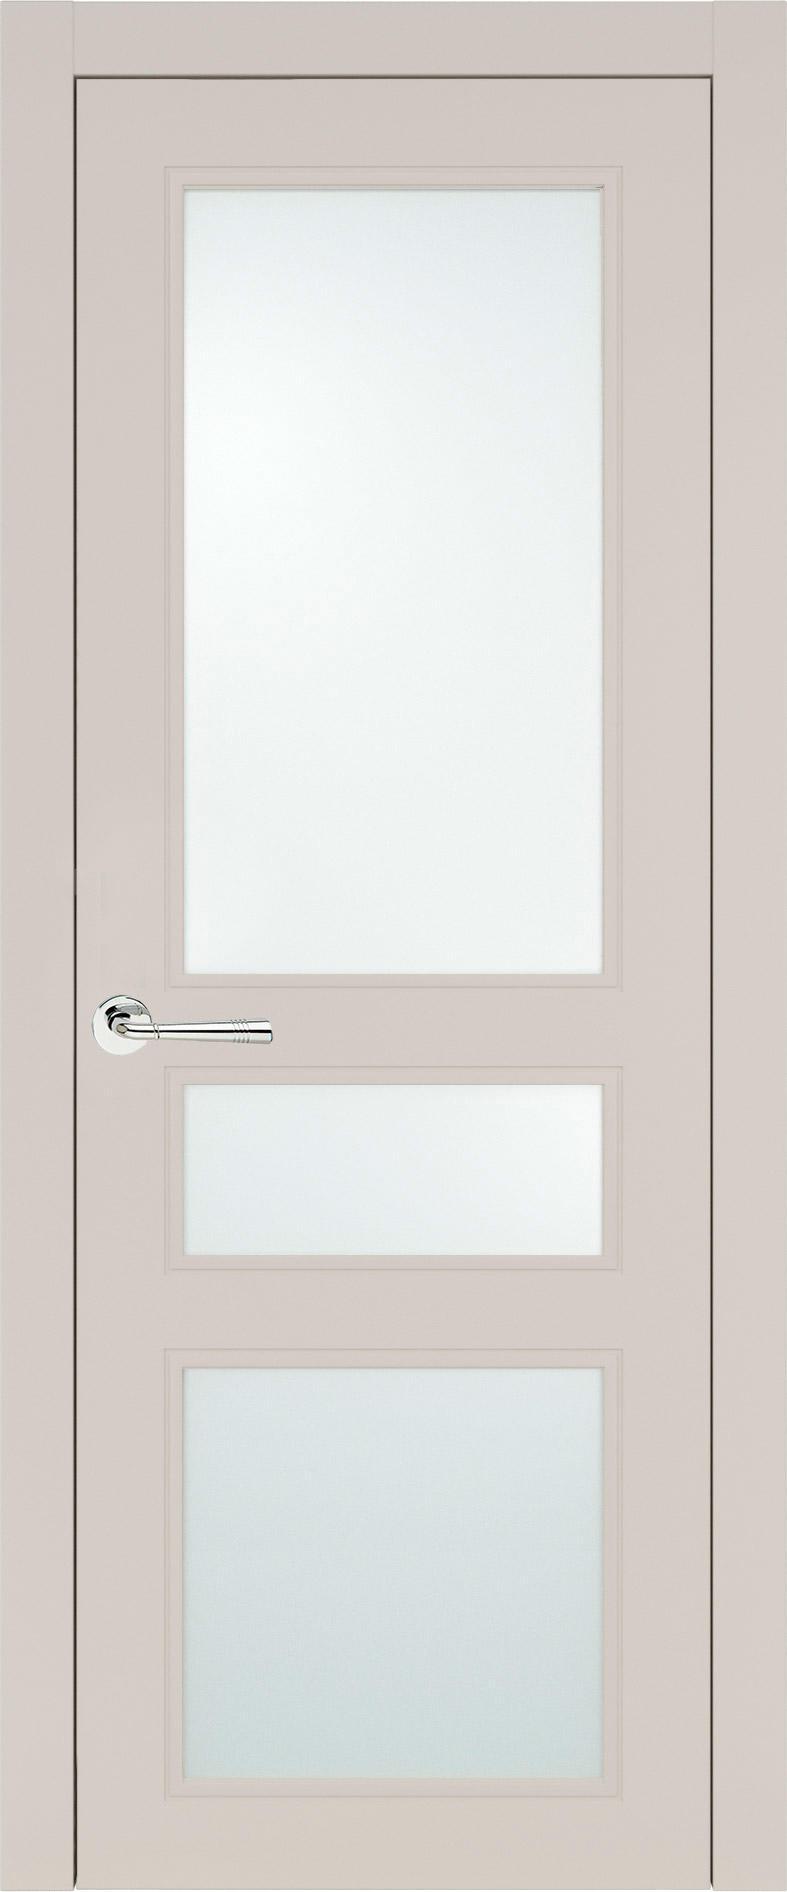 Imperia-R Neo Classic цвет - Жемчужная эмаль (RAL 1013) Со стеклом (ДО)